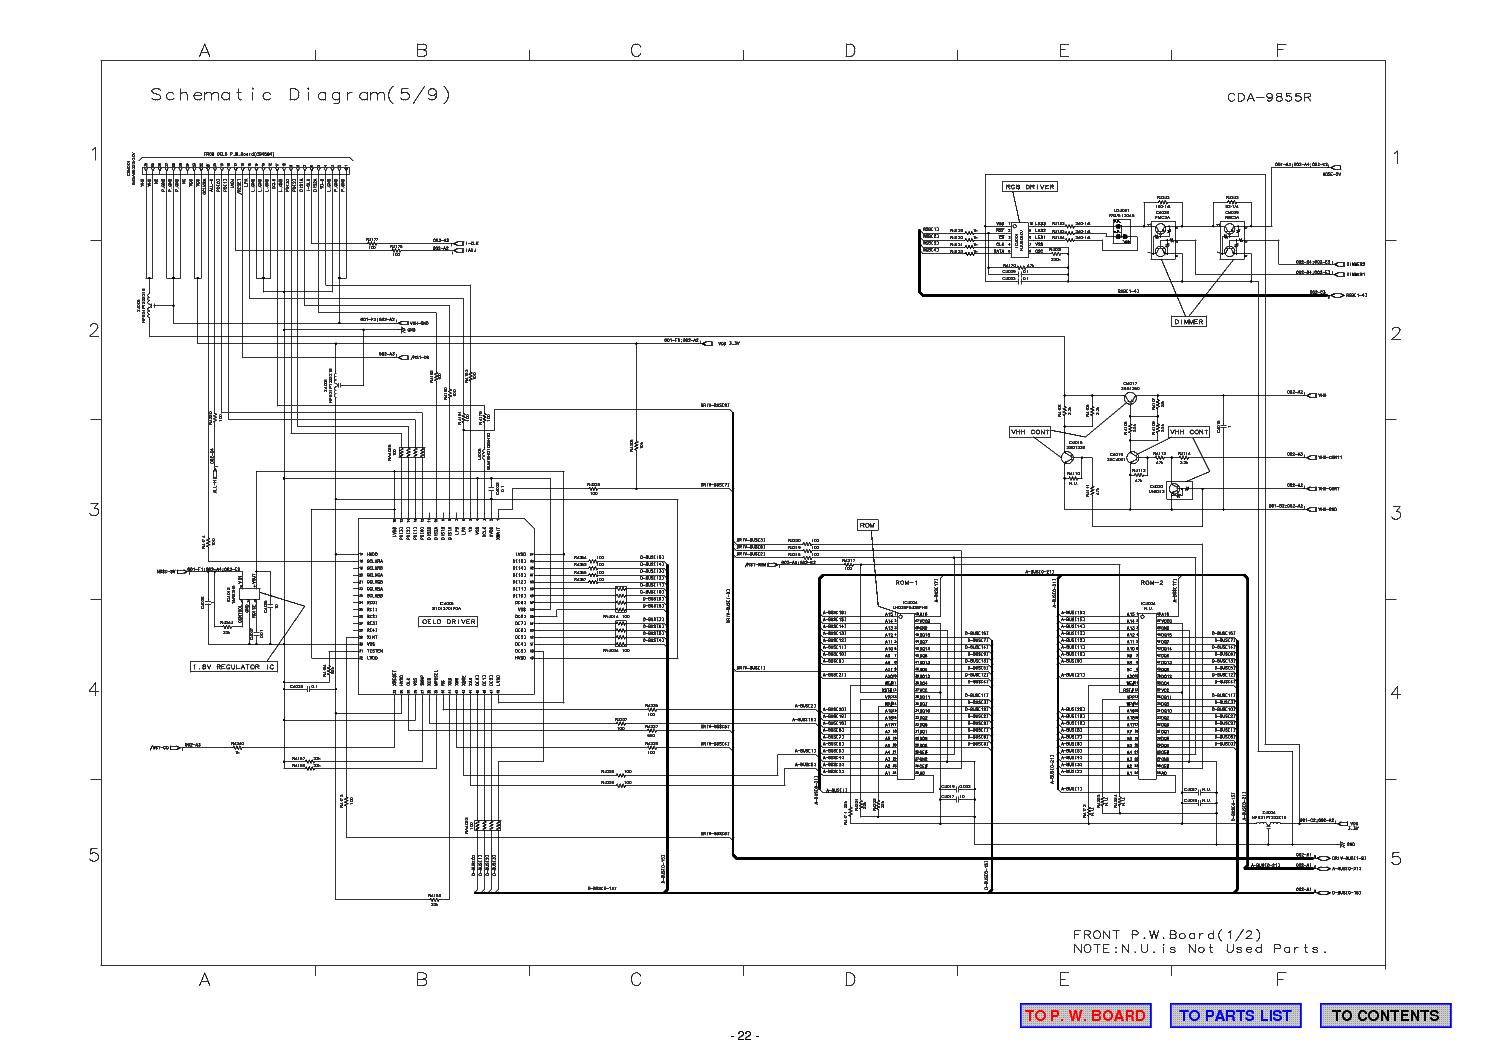 Alpine cda-9852rb схема